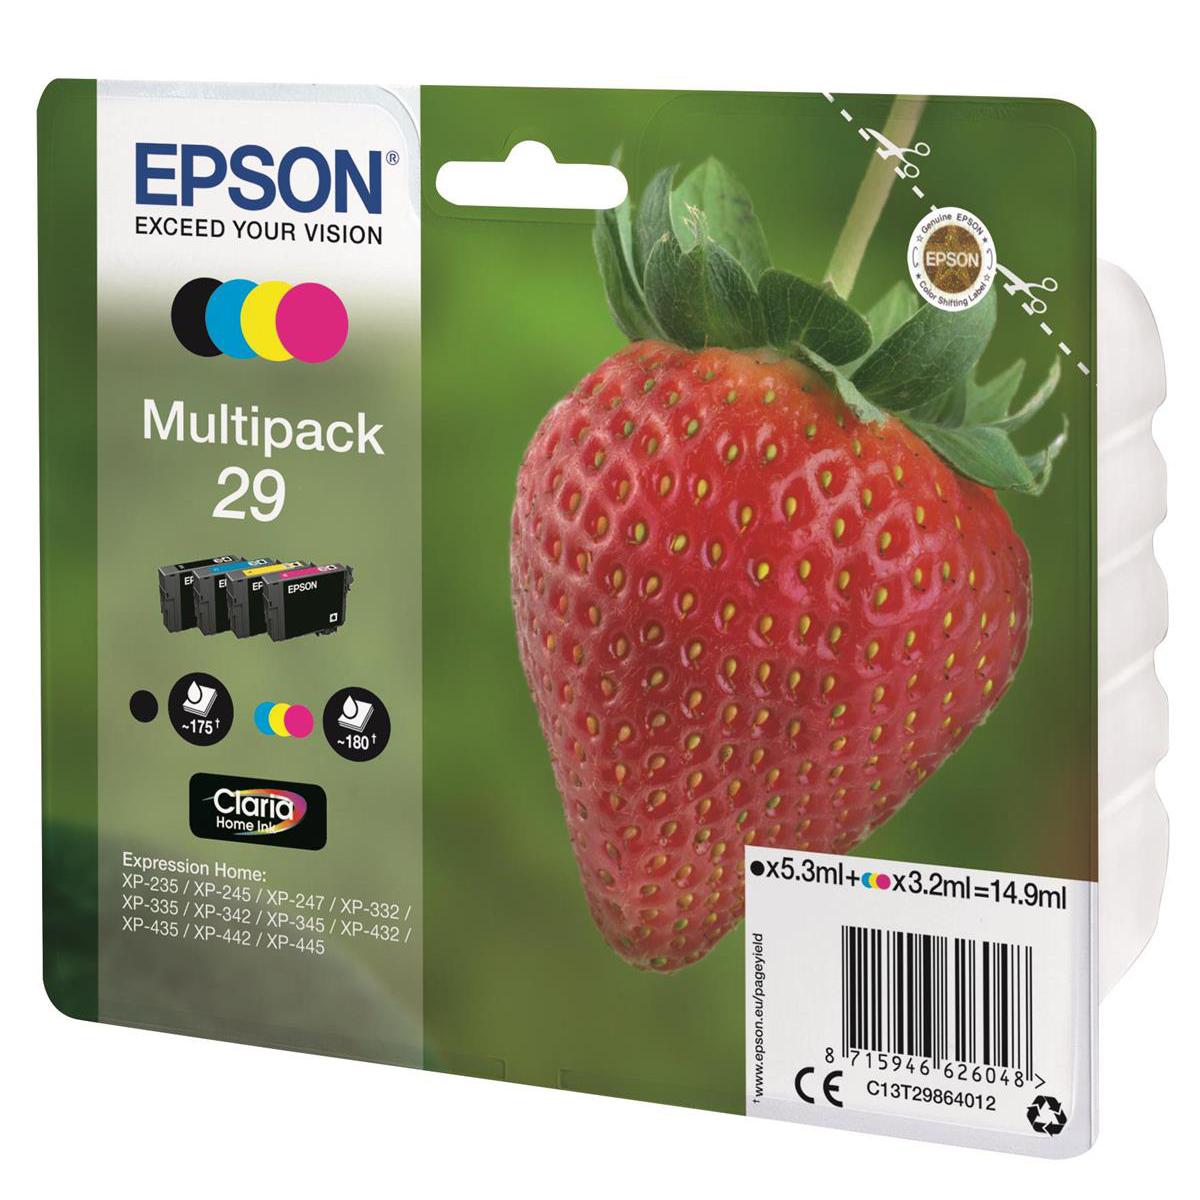 Epson 29 IJ Cart StrawberryPageLife 175pp Black 5.3ml 180pp Cyan/Mag/Yel 3.2ml Ref C13T29864012 Pack 4